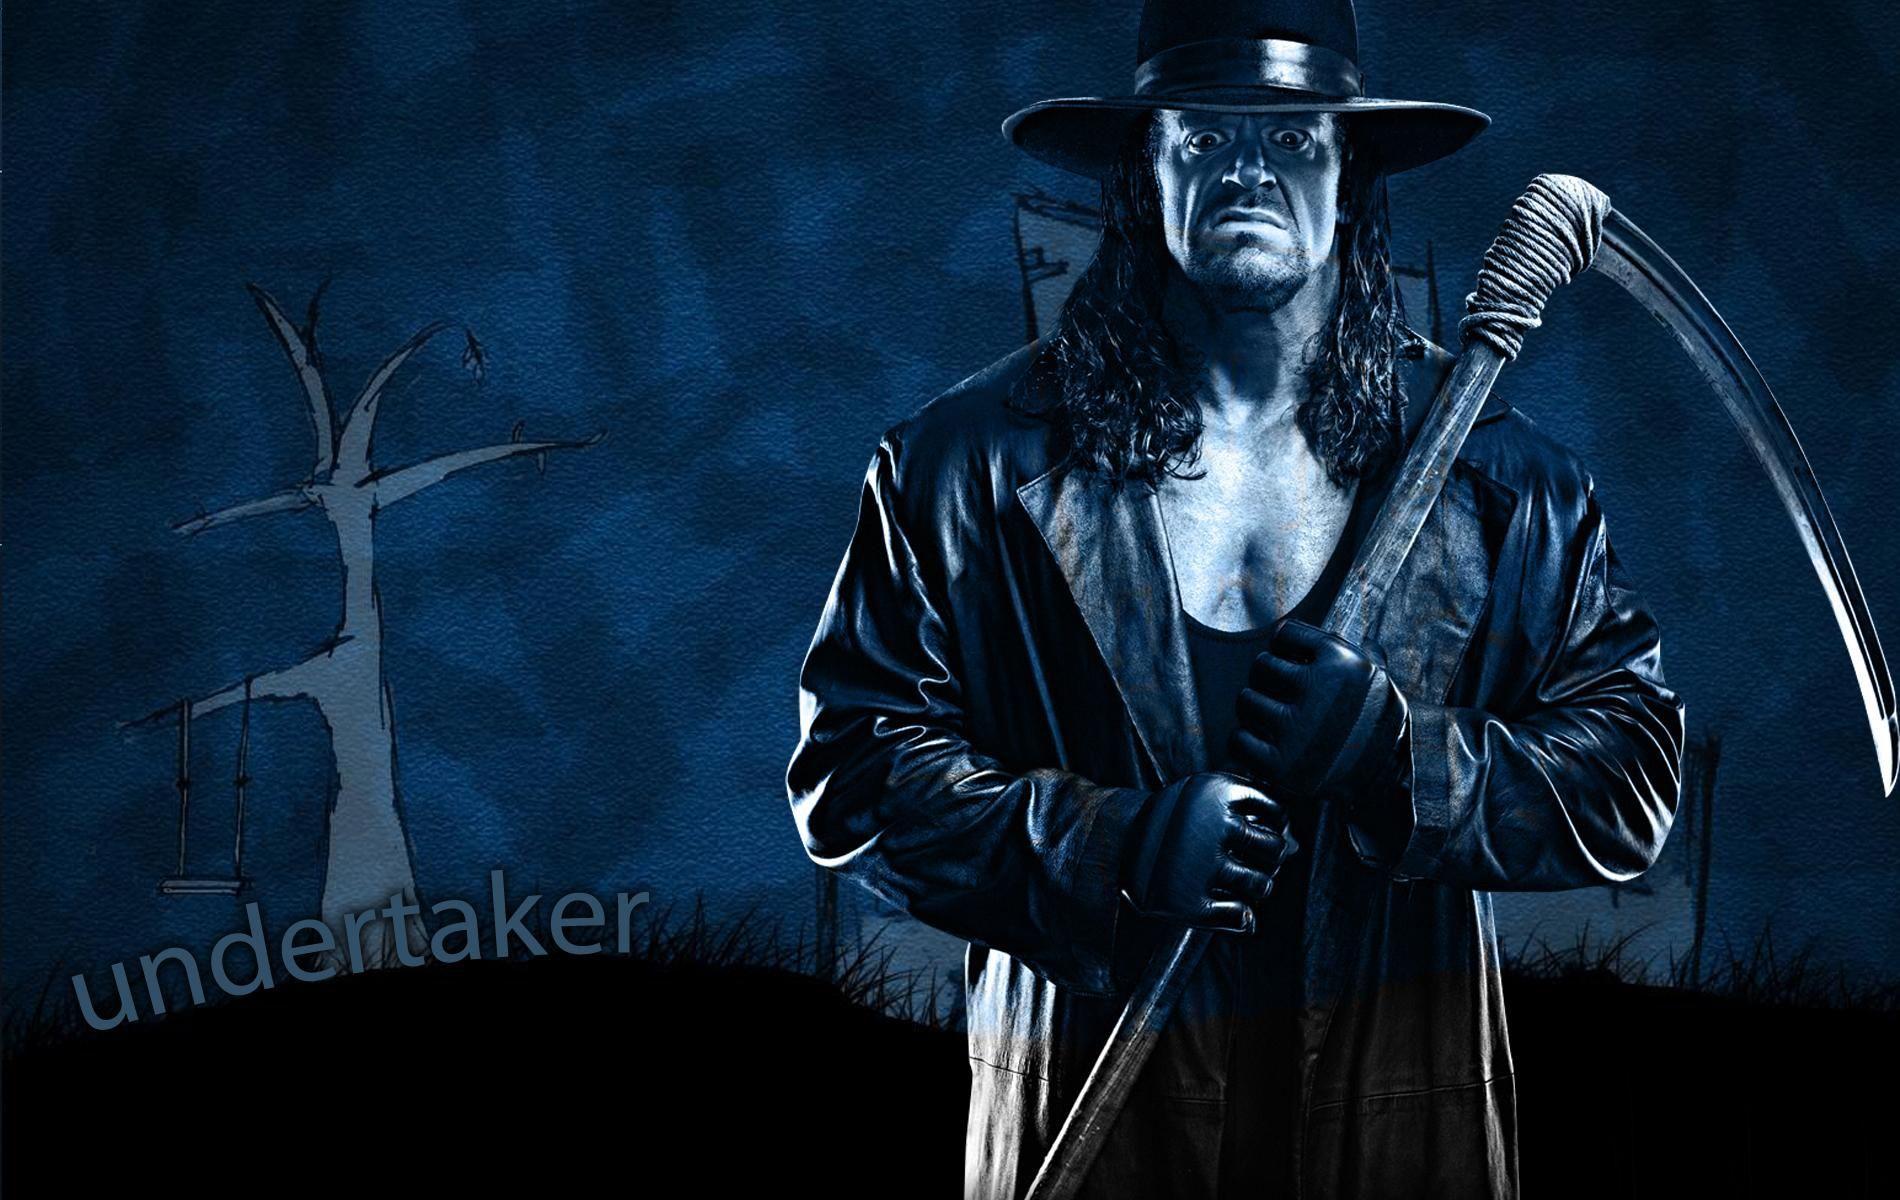 Image Result For Undertaker Wallpaper Undertaker Hd Cool Wallpapers Undertaker Wwe